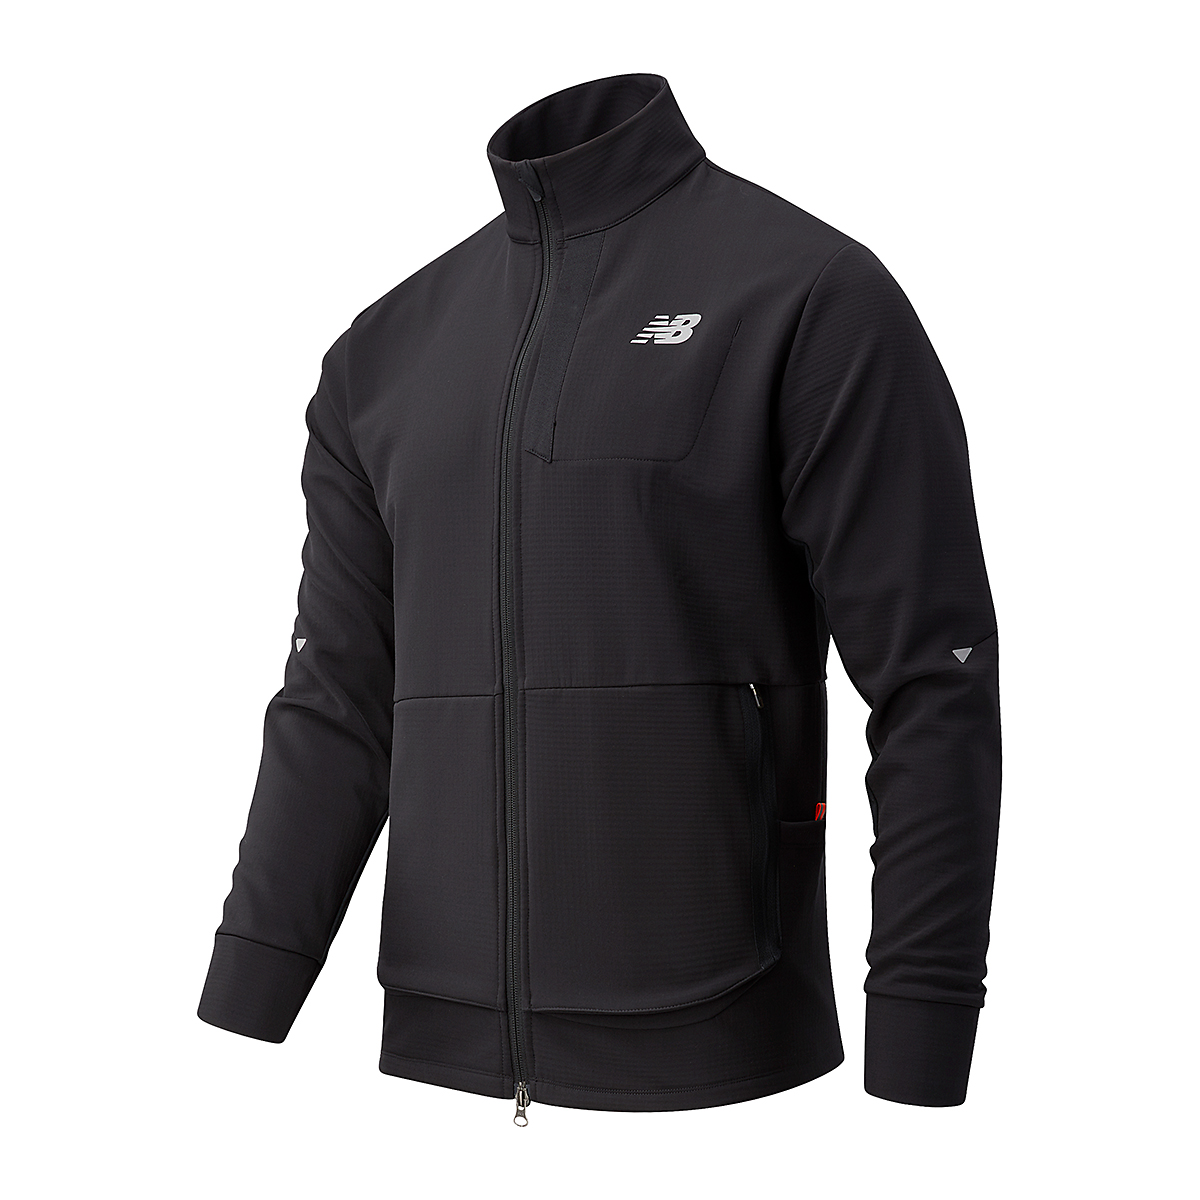 Men's New Balance Impact Run Winter Jacket - Color: Black - Size: S, Black, large, image 1